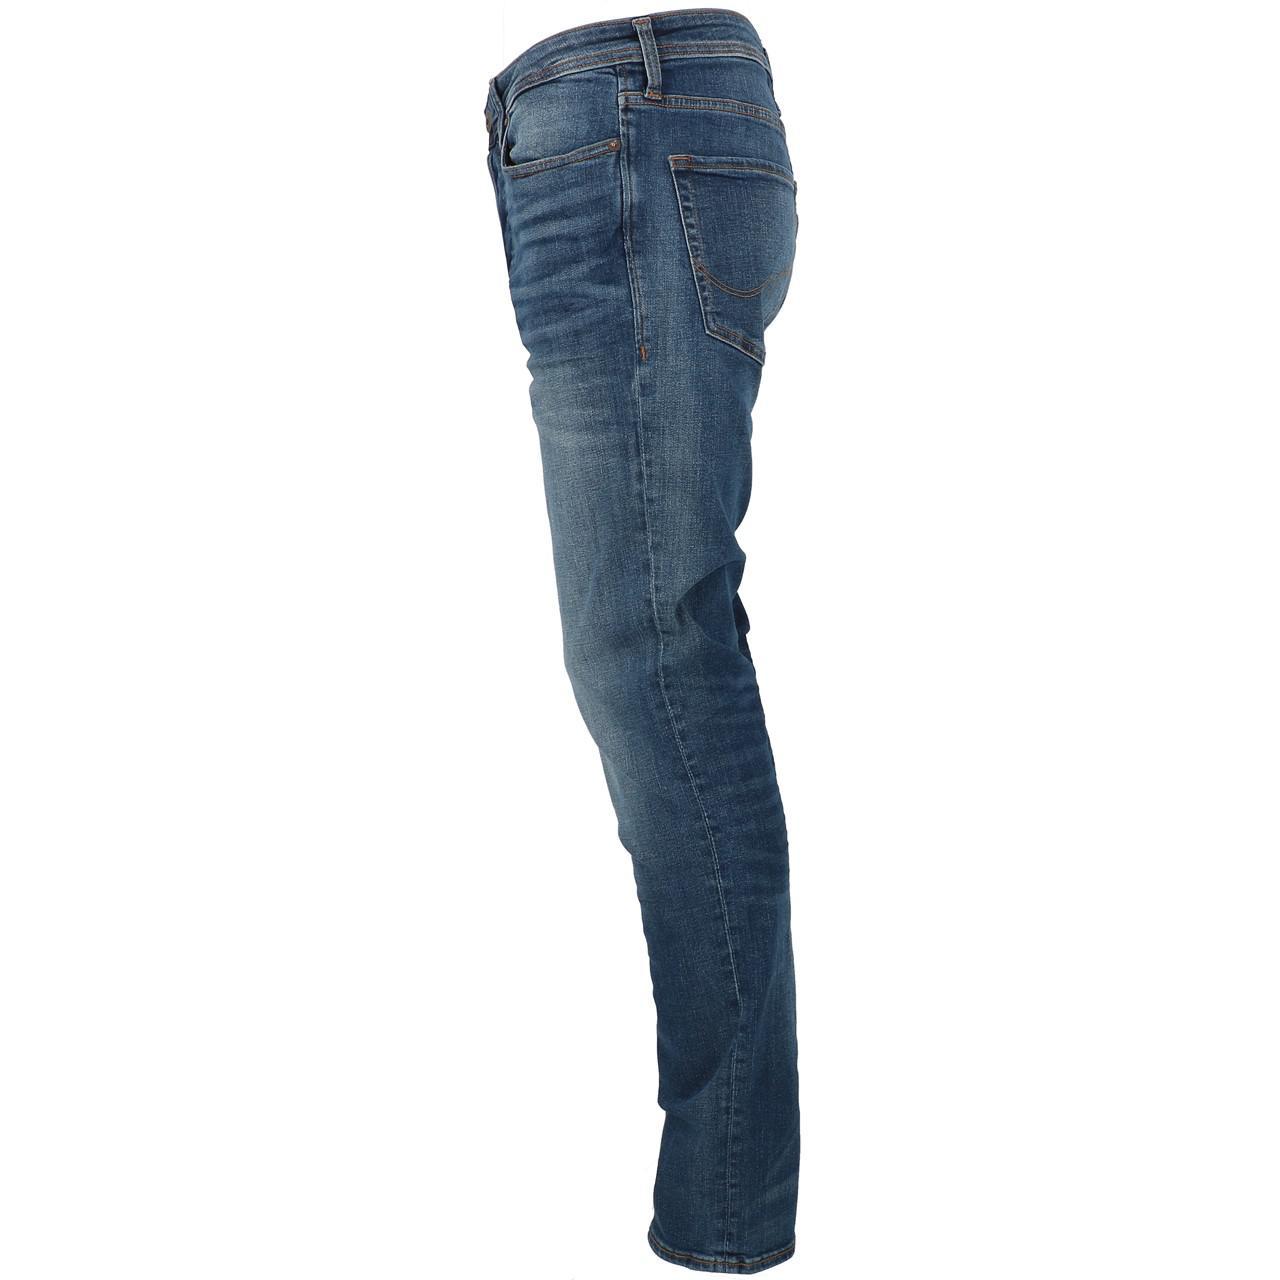 Jeans-Pants-Jack-and-jones-Tim-34-Blue-Denim-Blue-Jeans-19918-New thumbnail 2